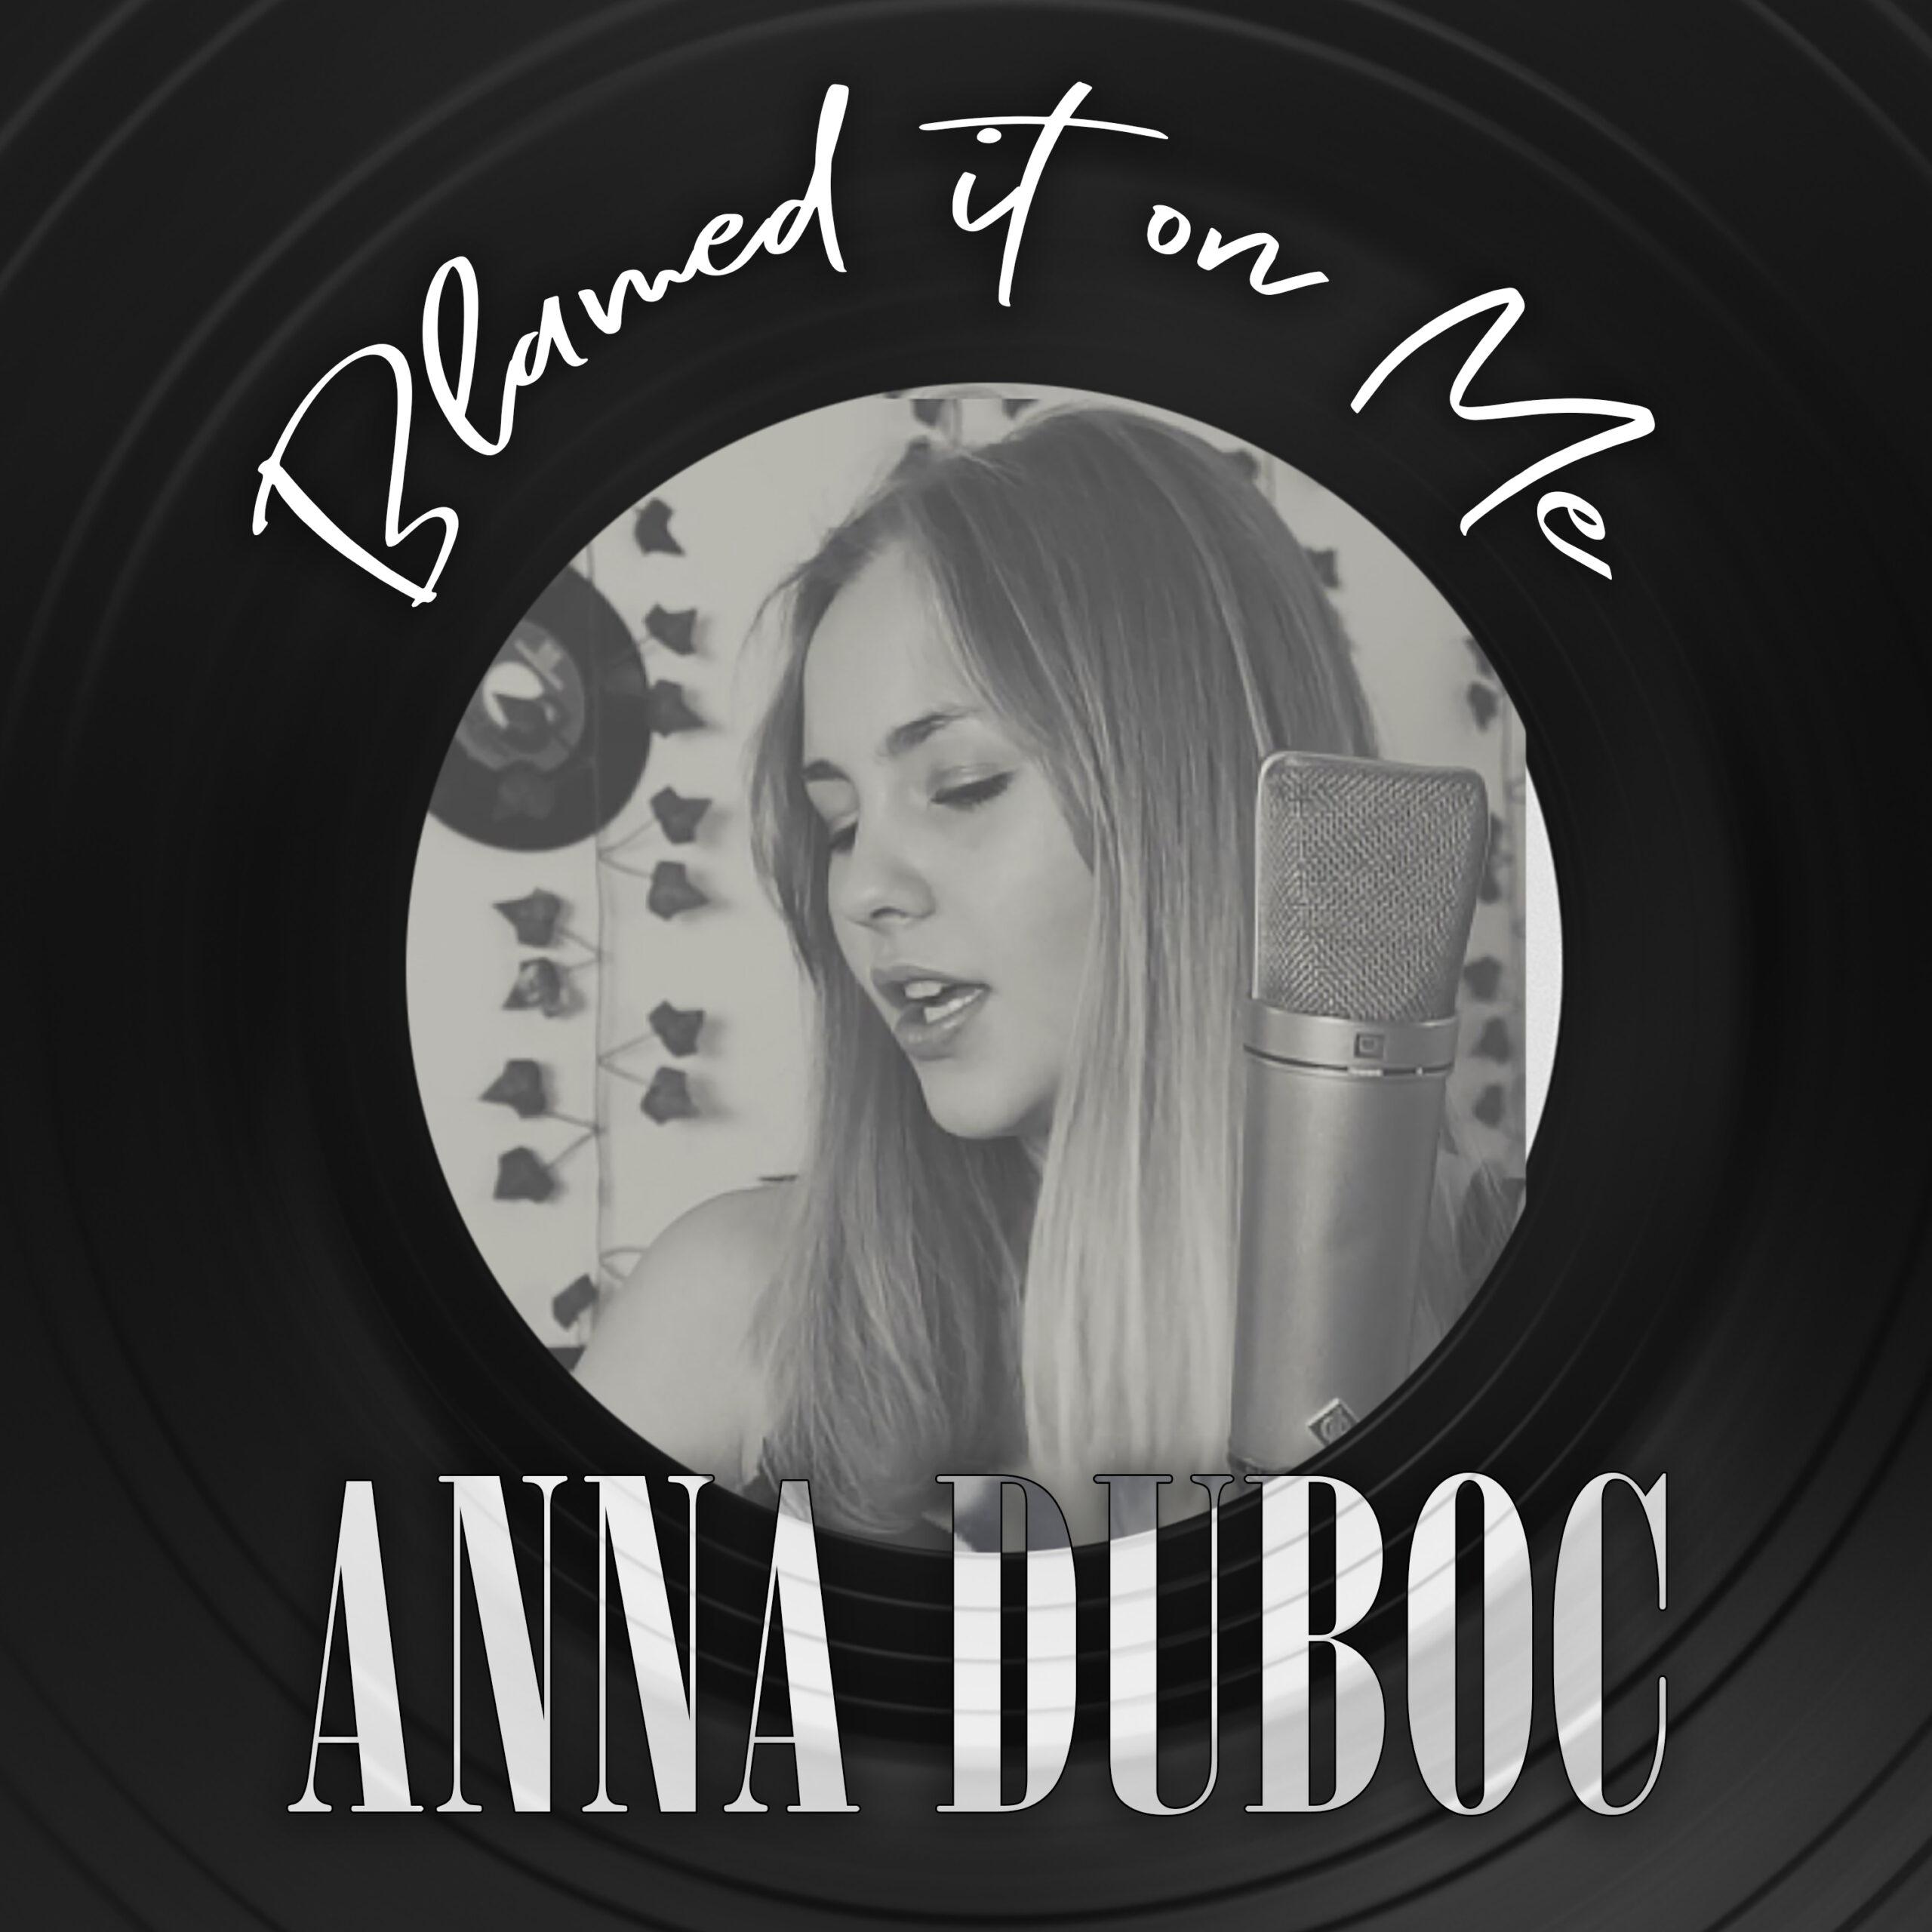 Blamed it on me: Anna Duboc